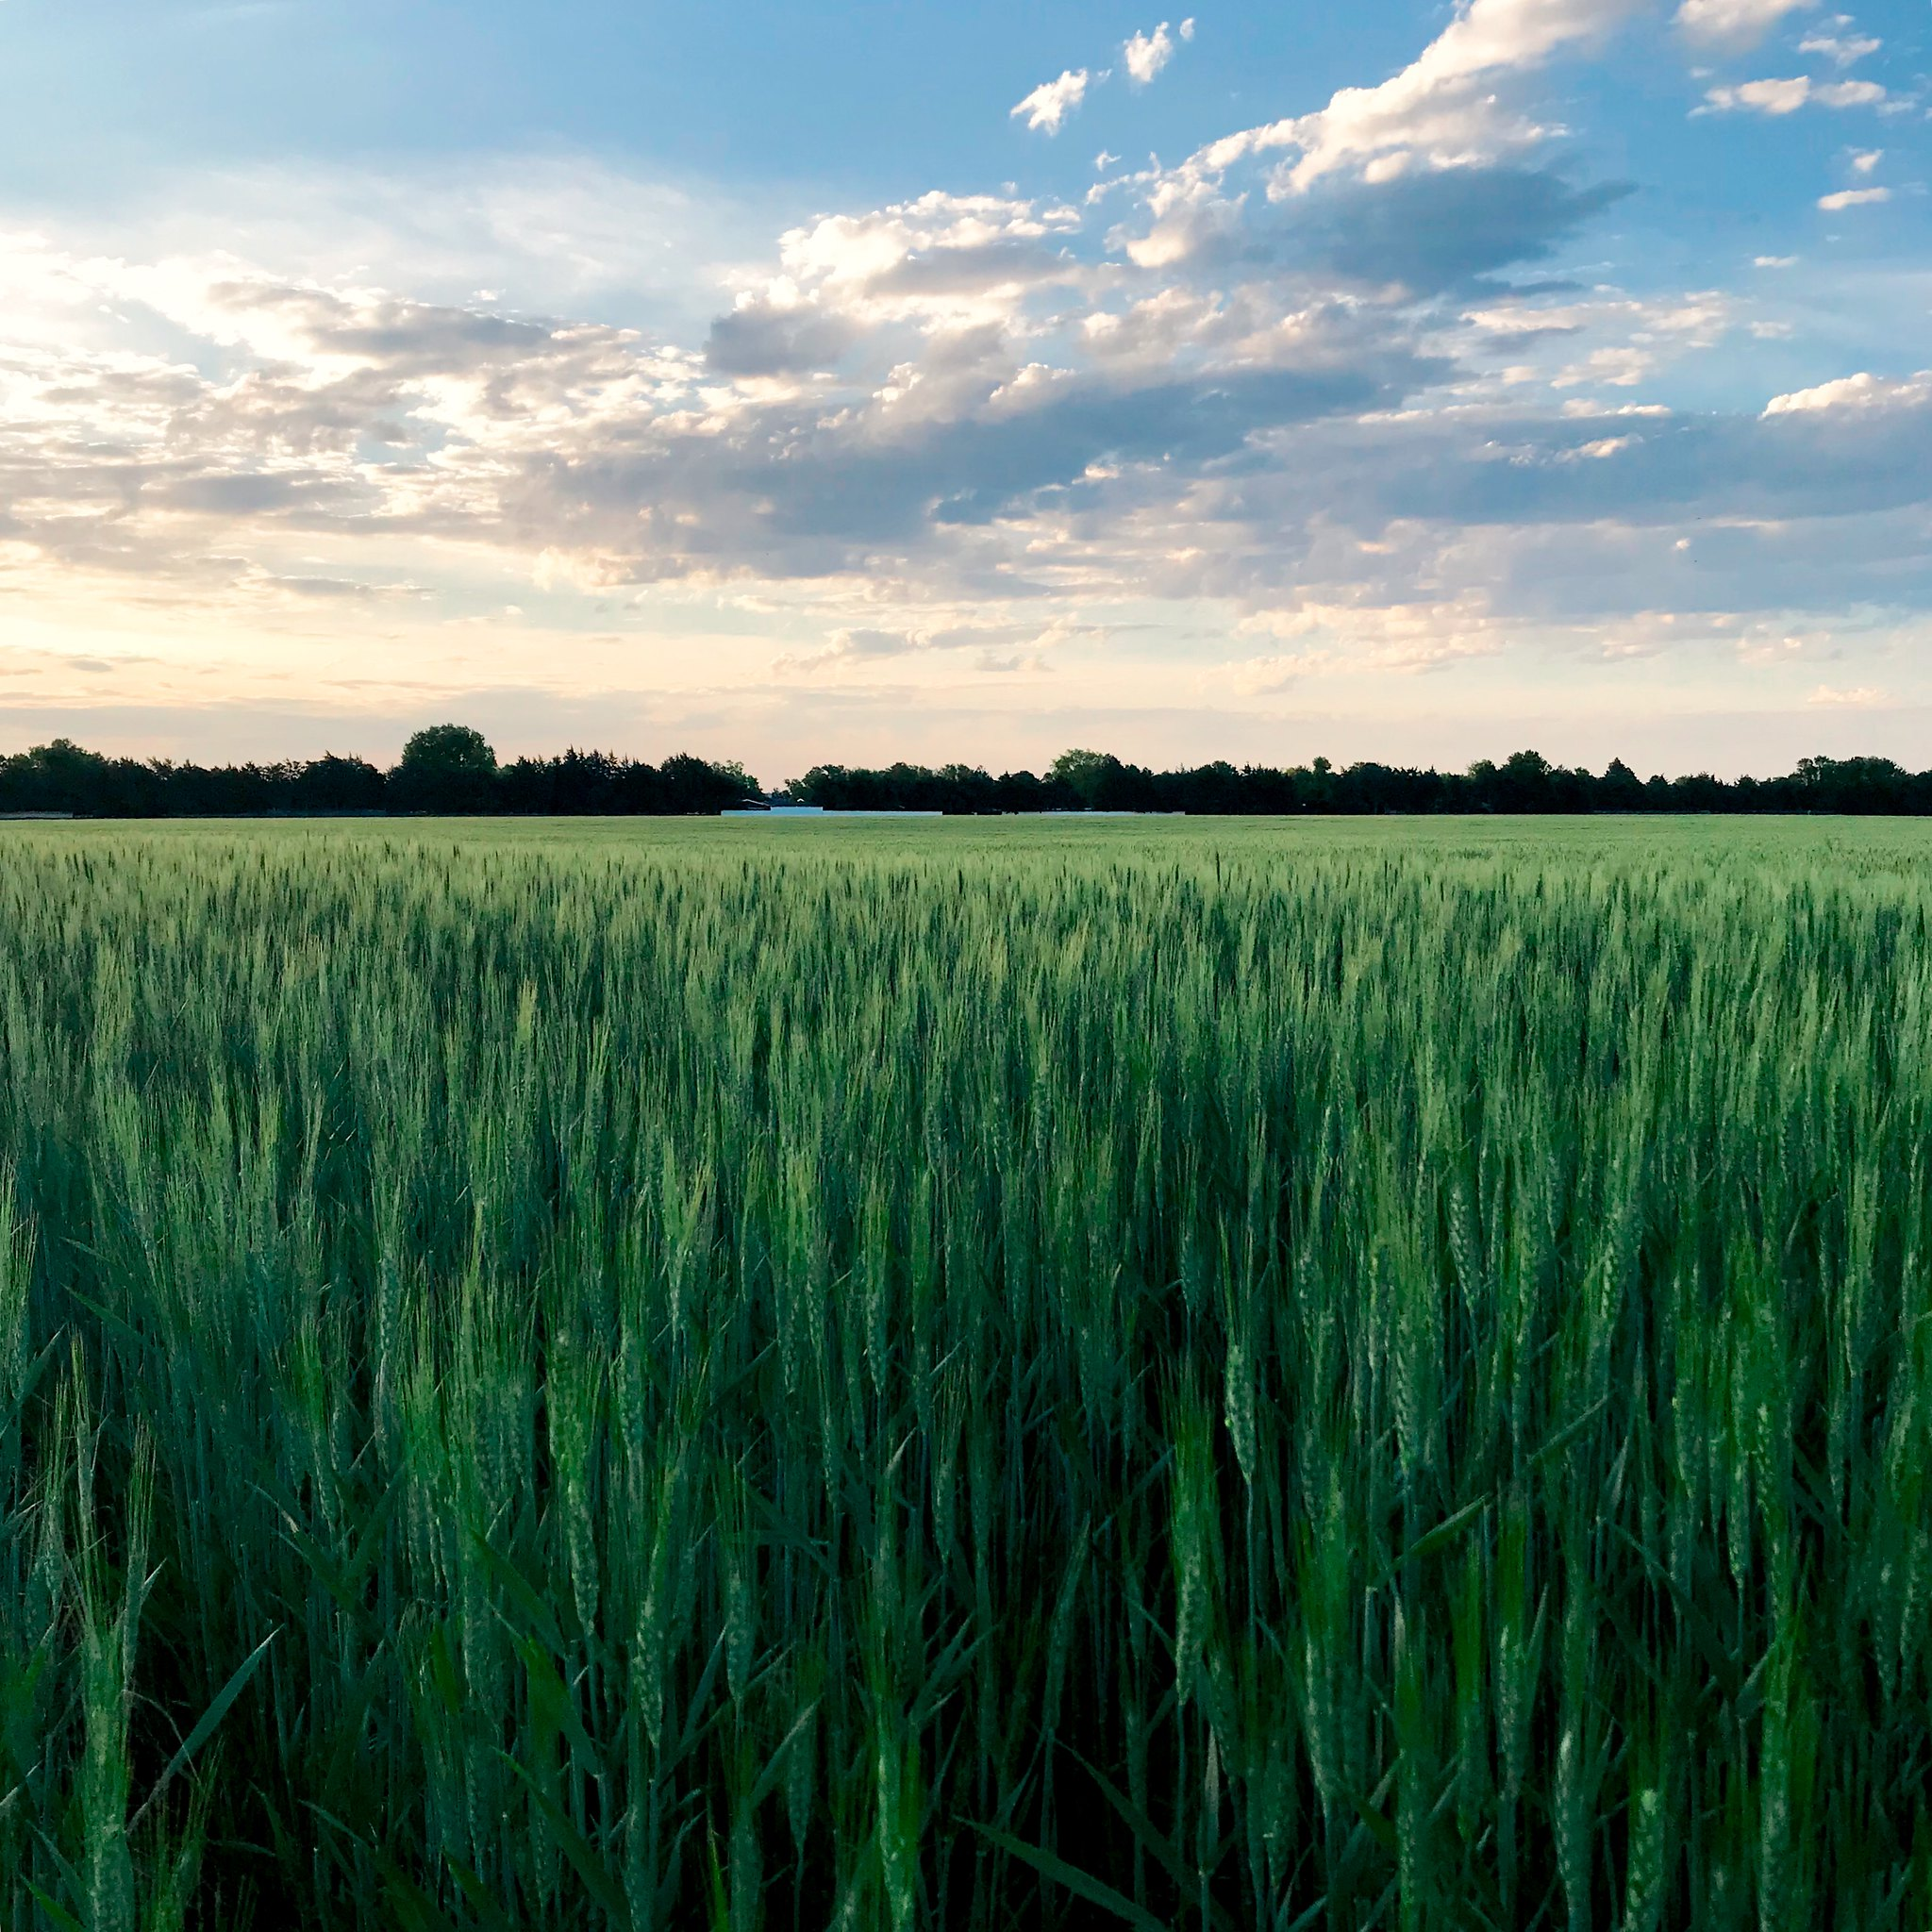 Photo Credit: Laura Haffner - High Plains Harvesting